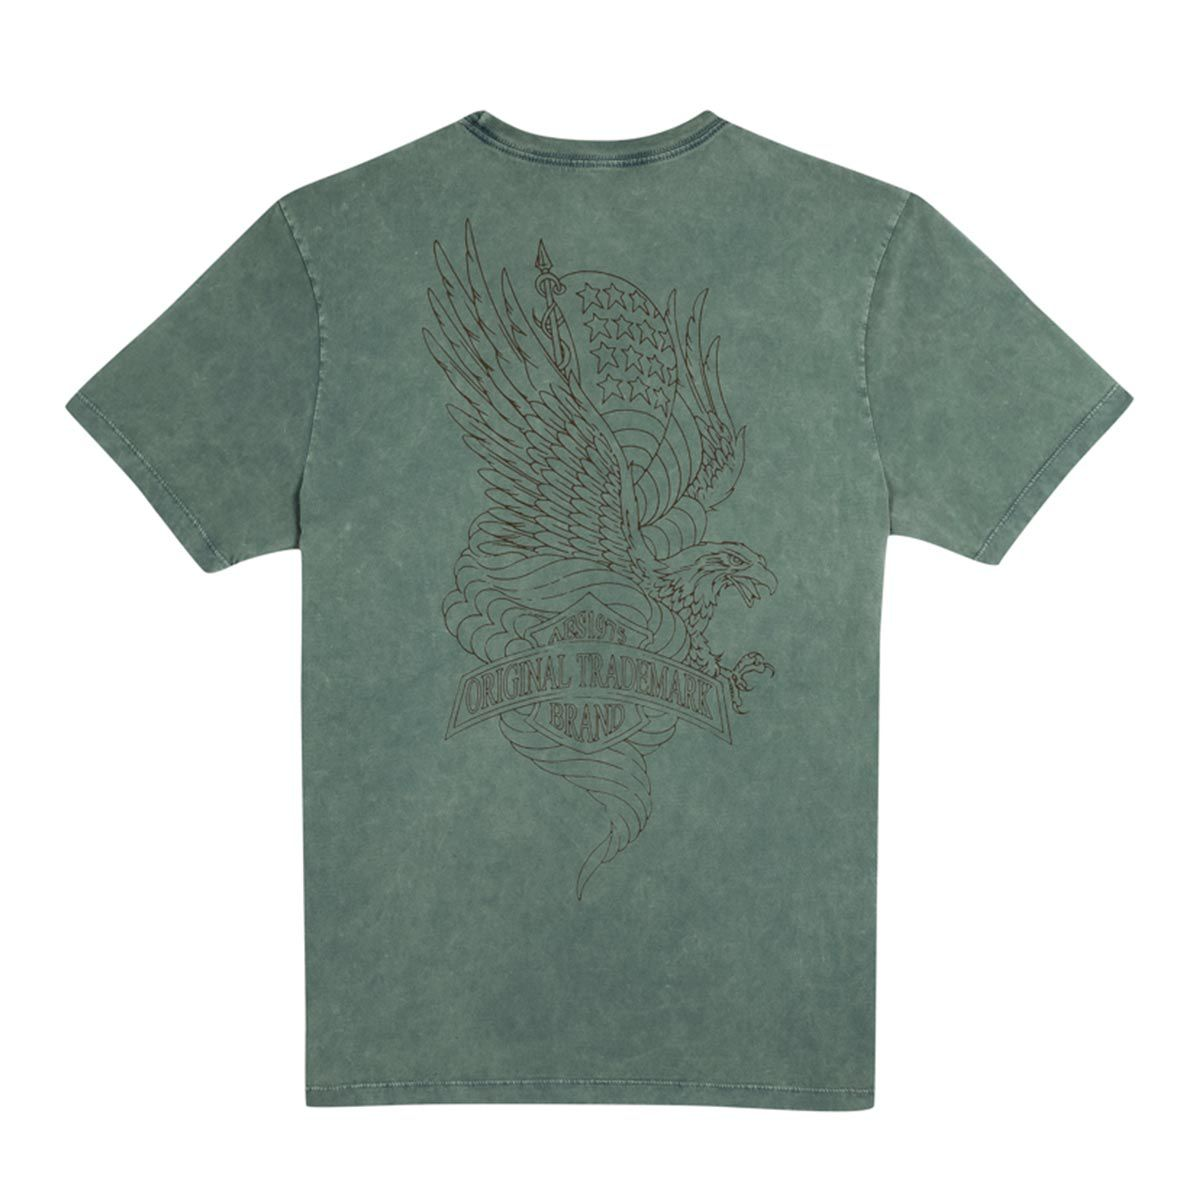 Camiseta AES 1975 Eagle Flight